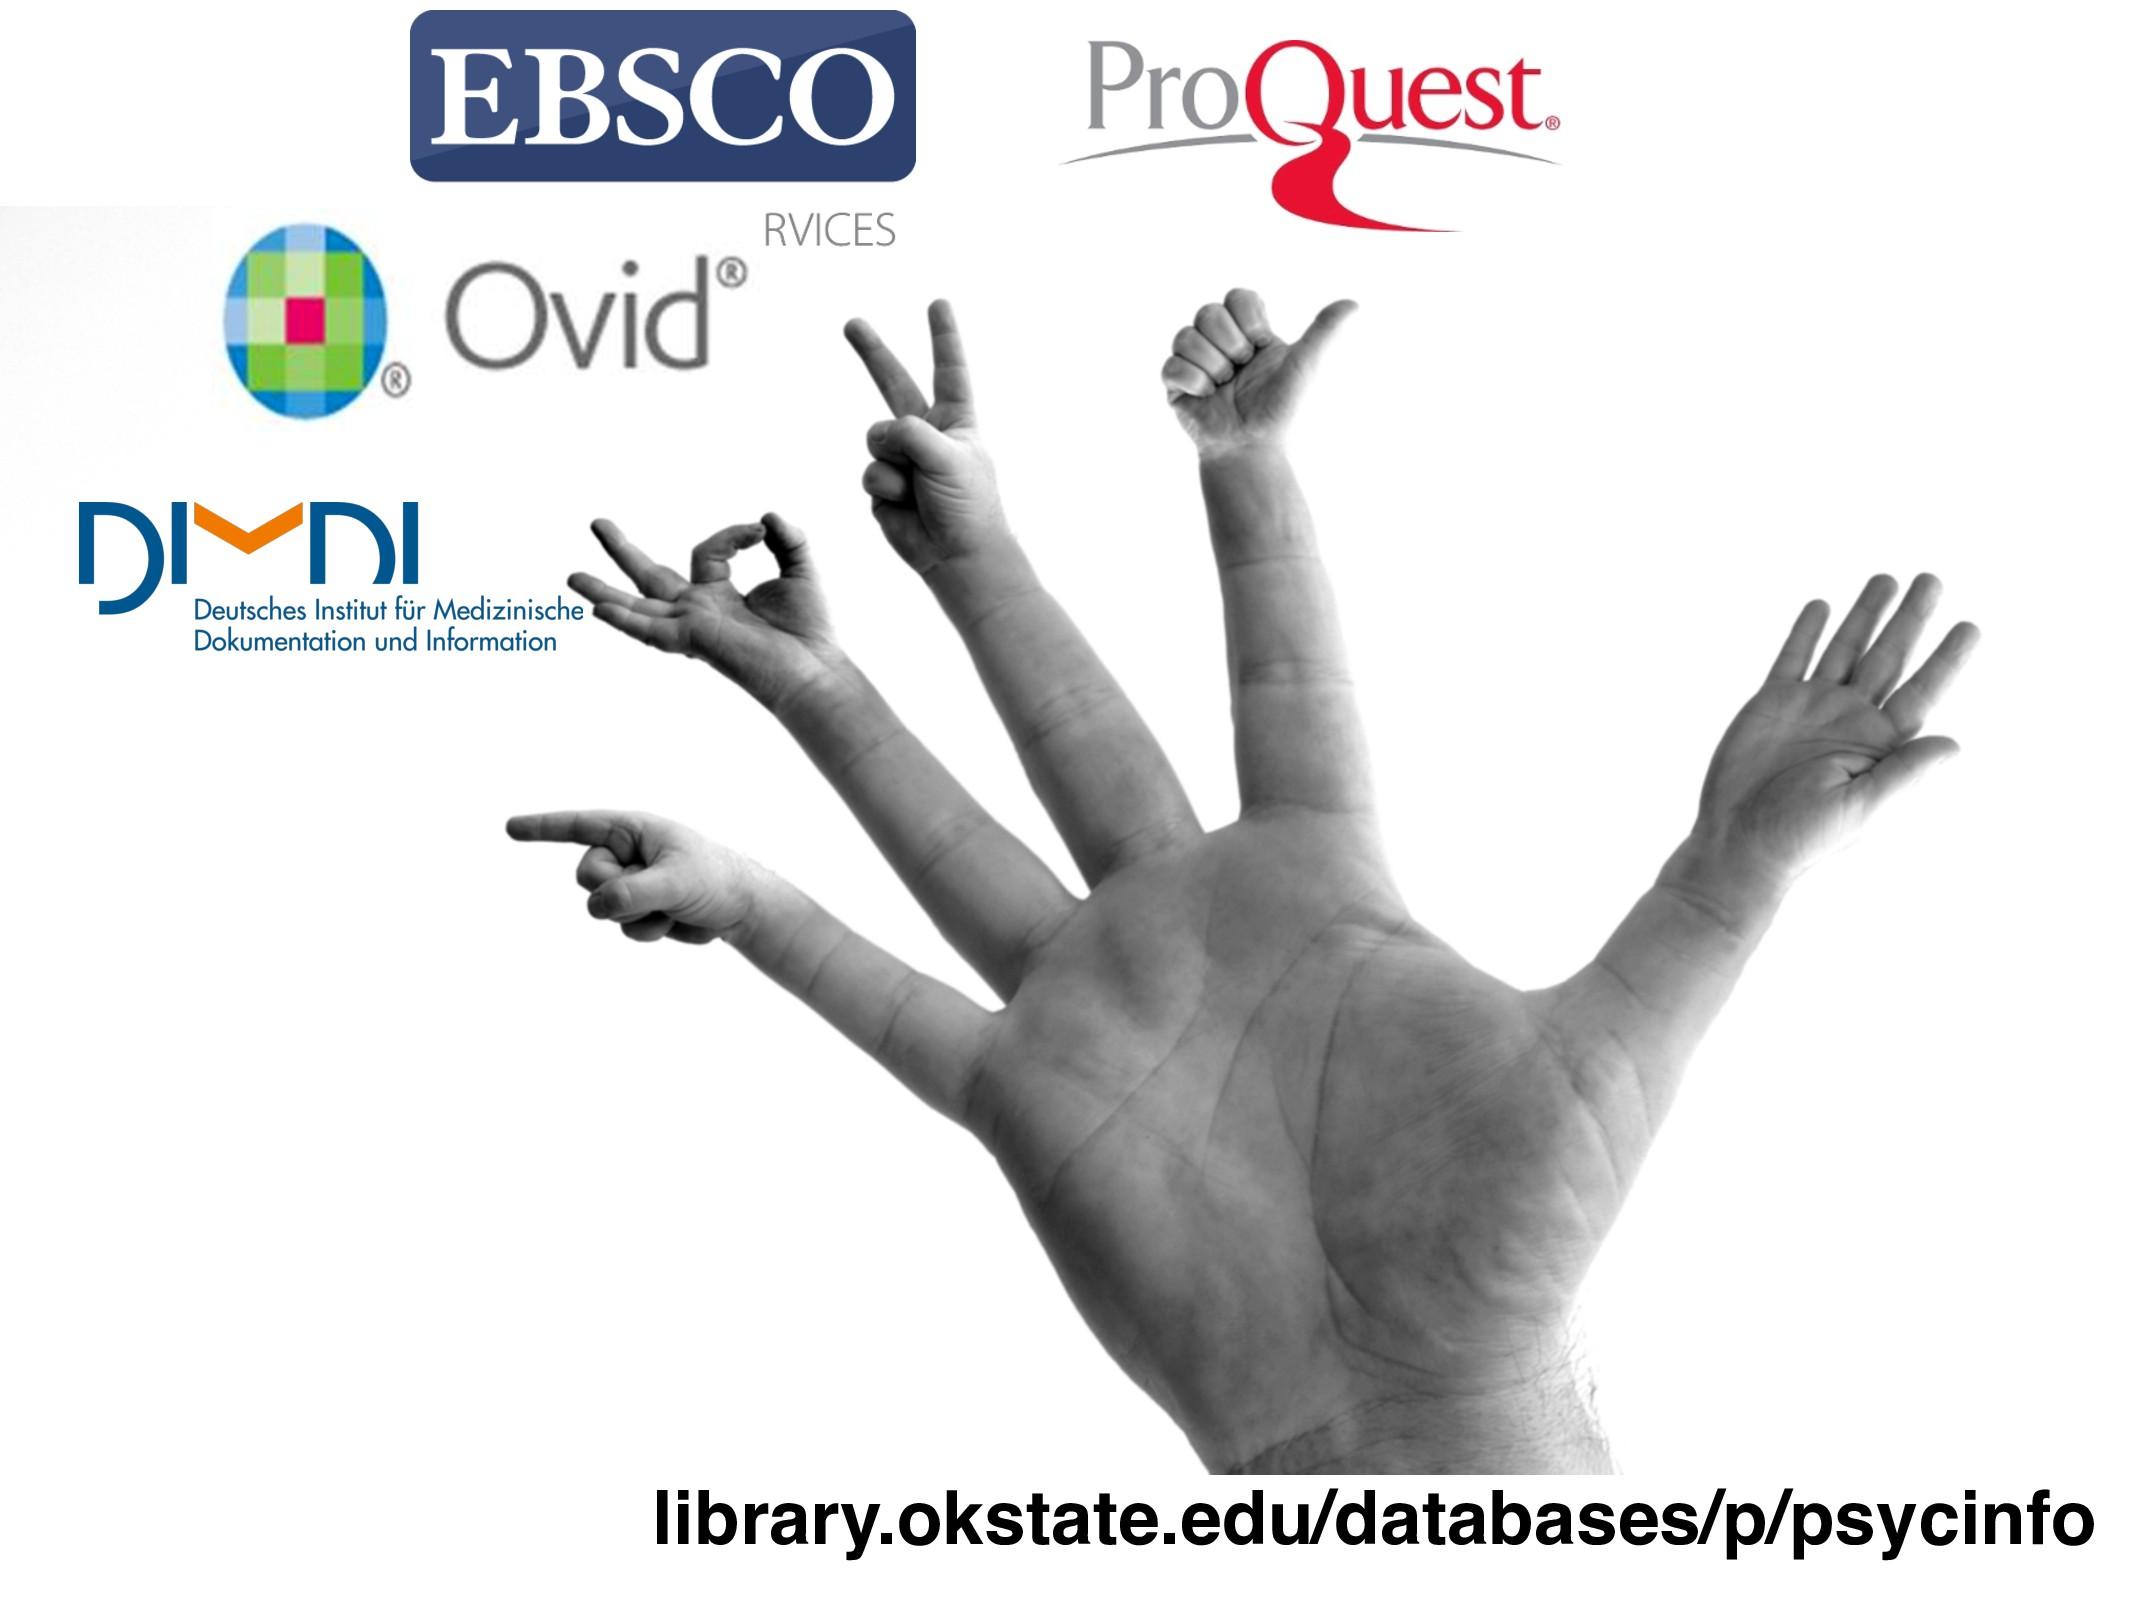 library.okstate.edu/databases/p/psycinfo